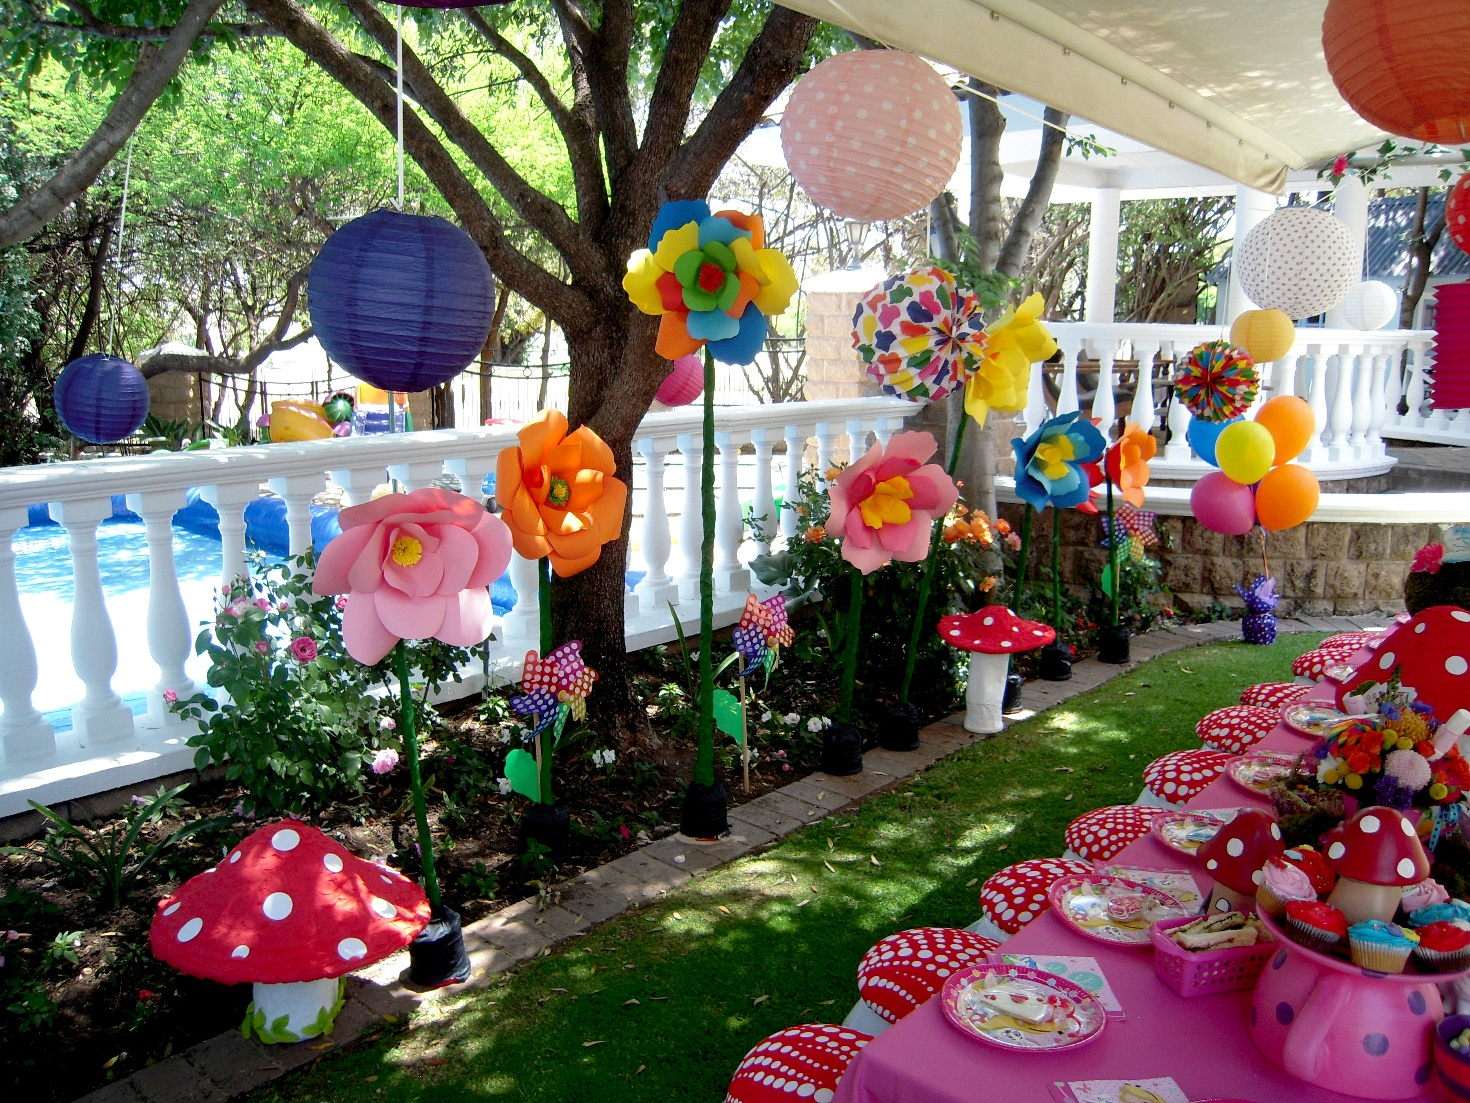 Alice In Wonderland Hedgehog Lane Themed Party Decor